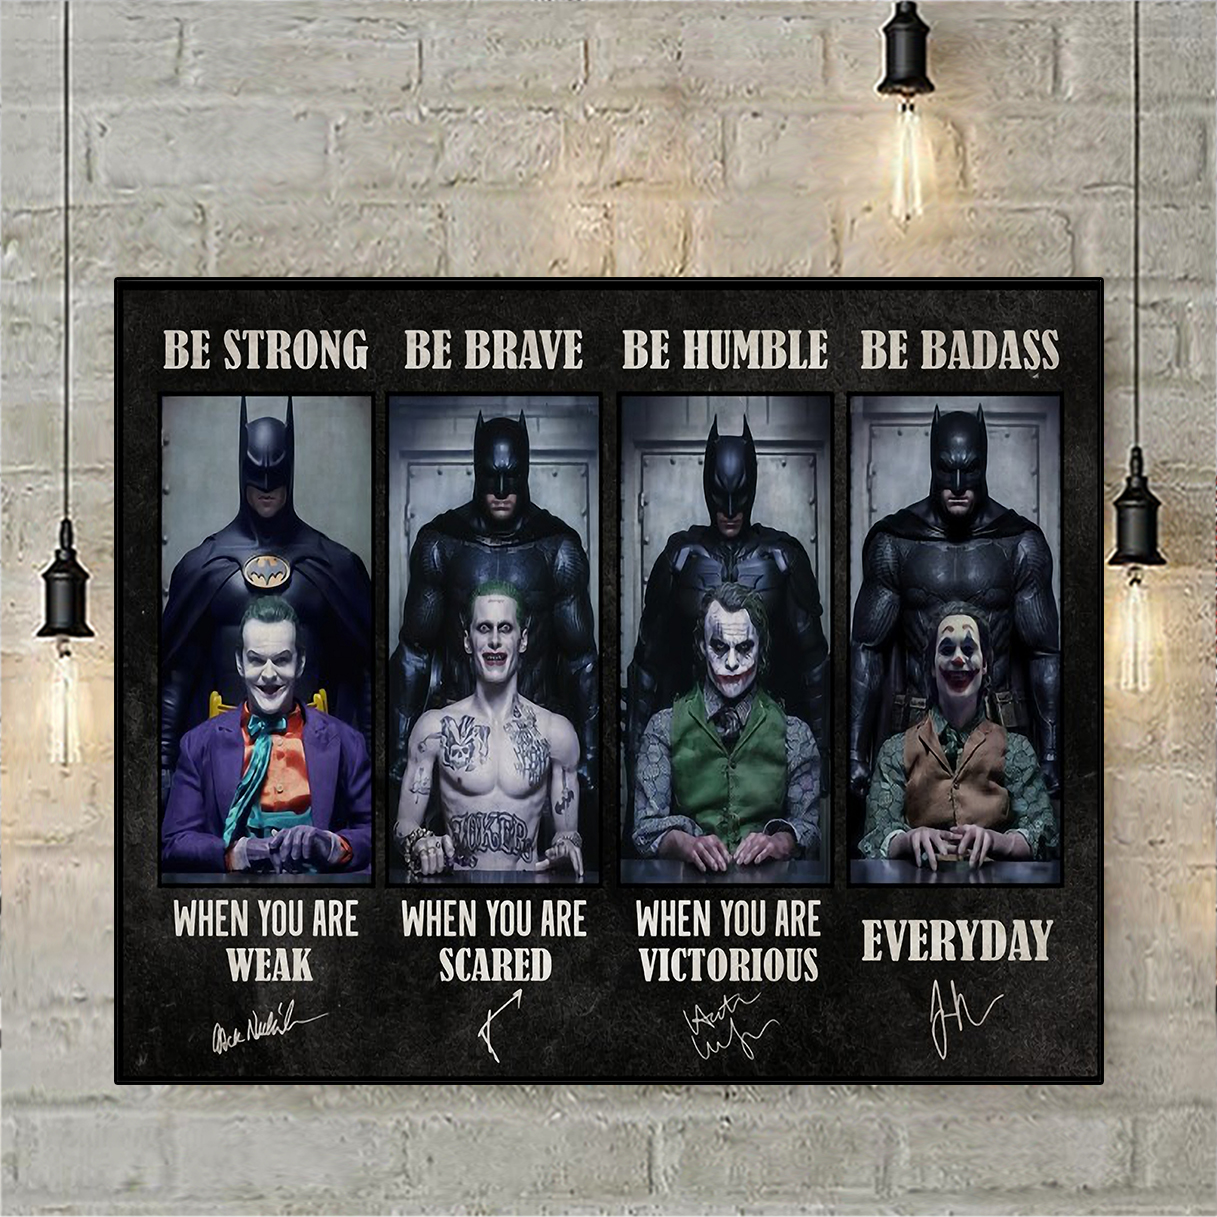 Batman joker be strong be brave be humble be badass poster A3